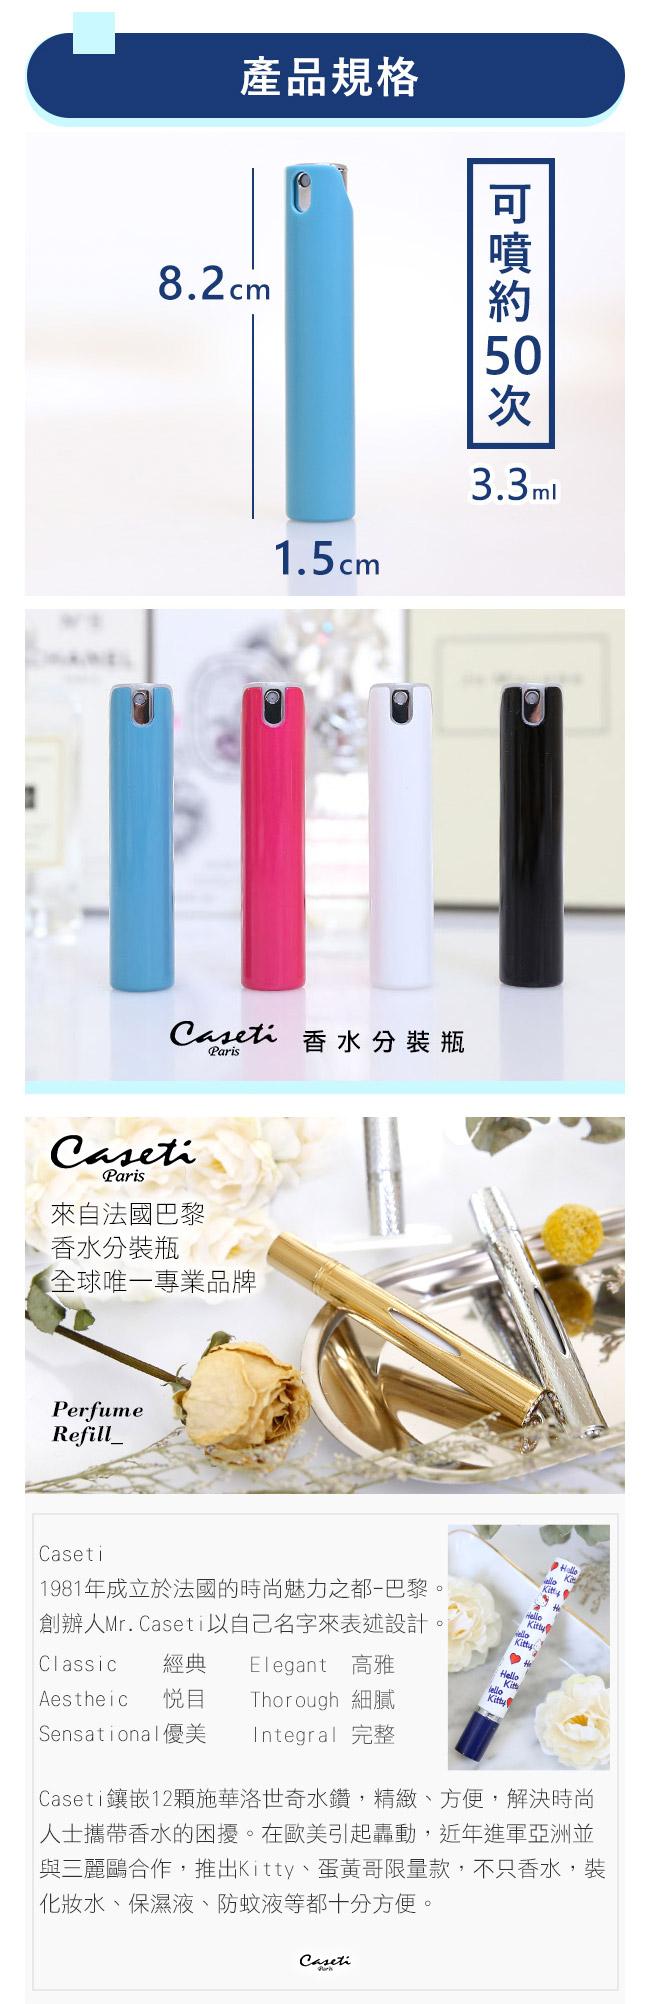 Caseti|超值組 |紫色 超輕藍 旅行香水瓶